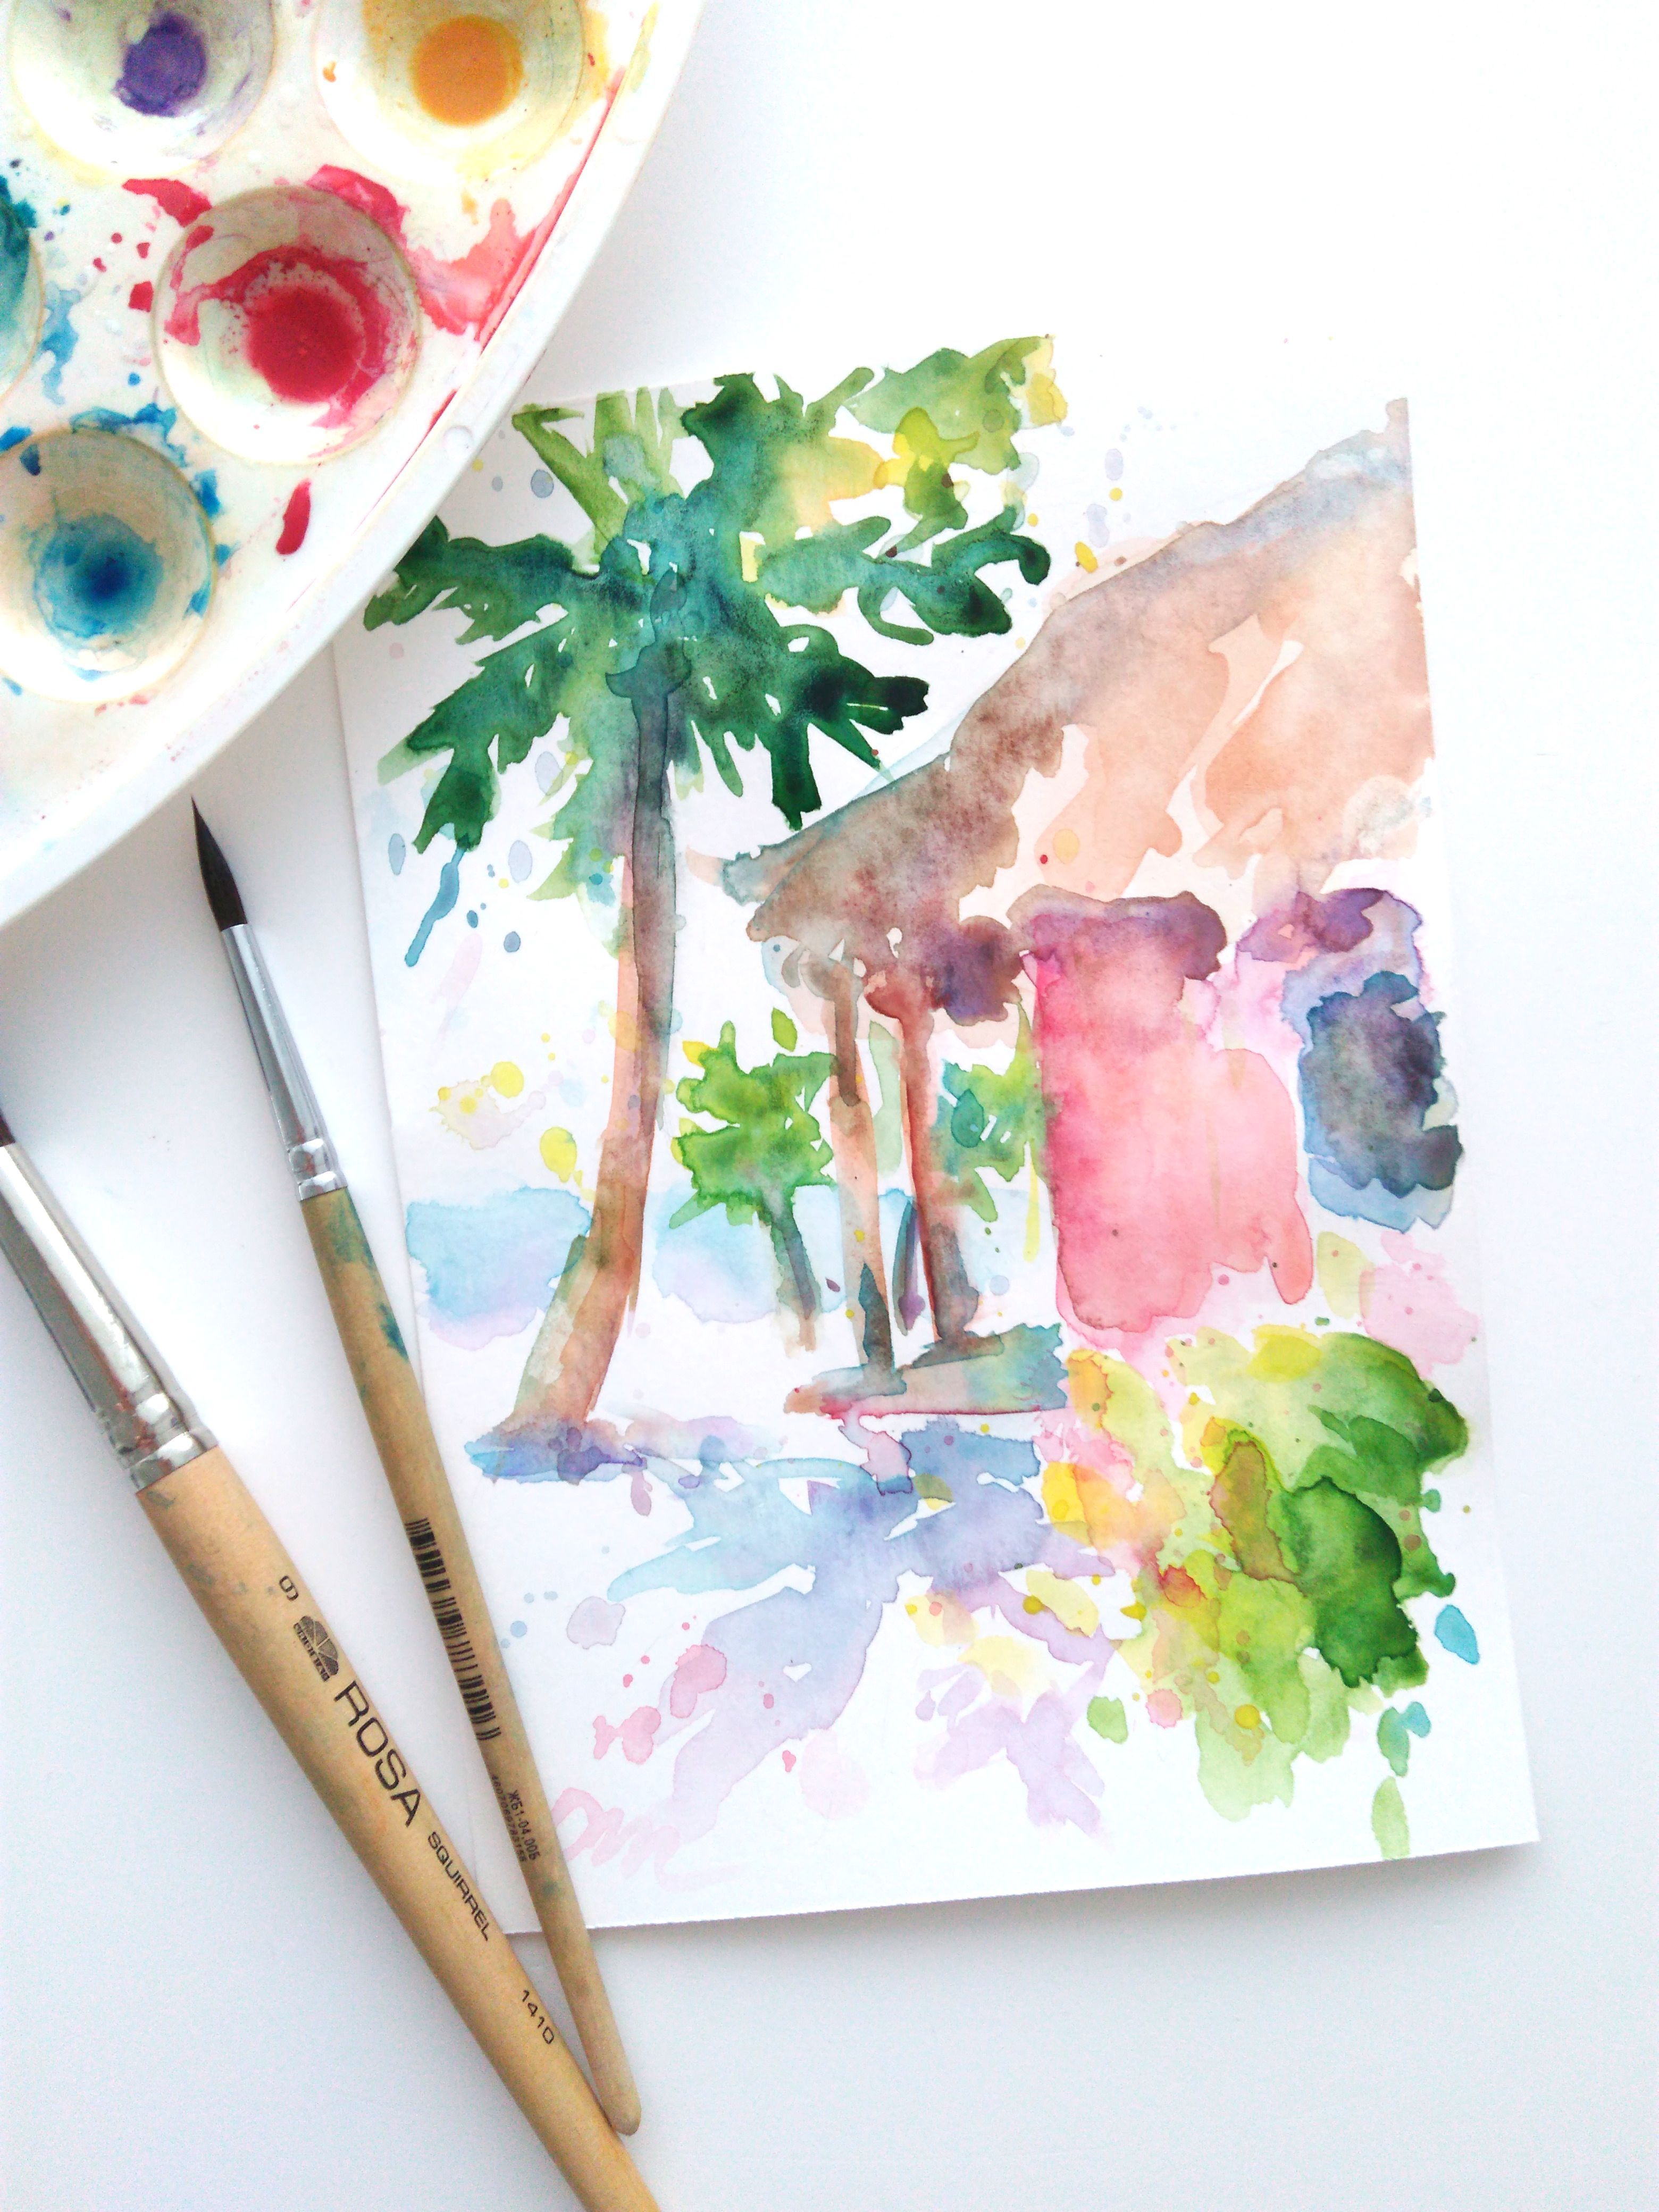 Hawaii Beach Watercolor Painting Original Small Art Tropical